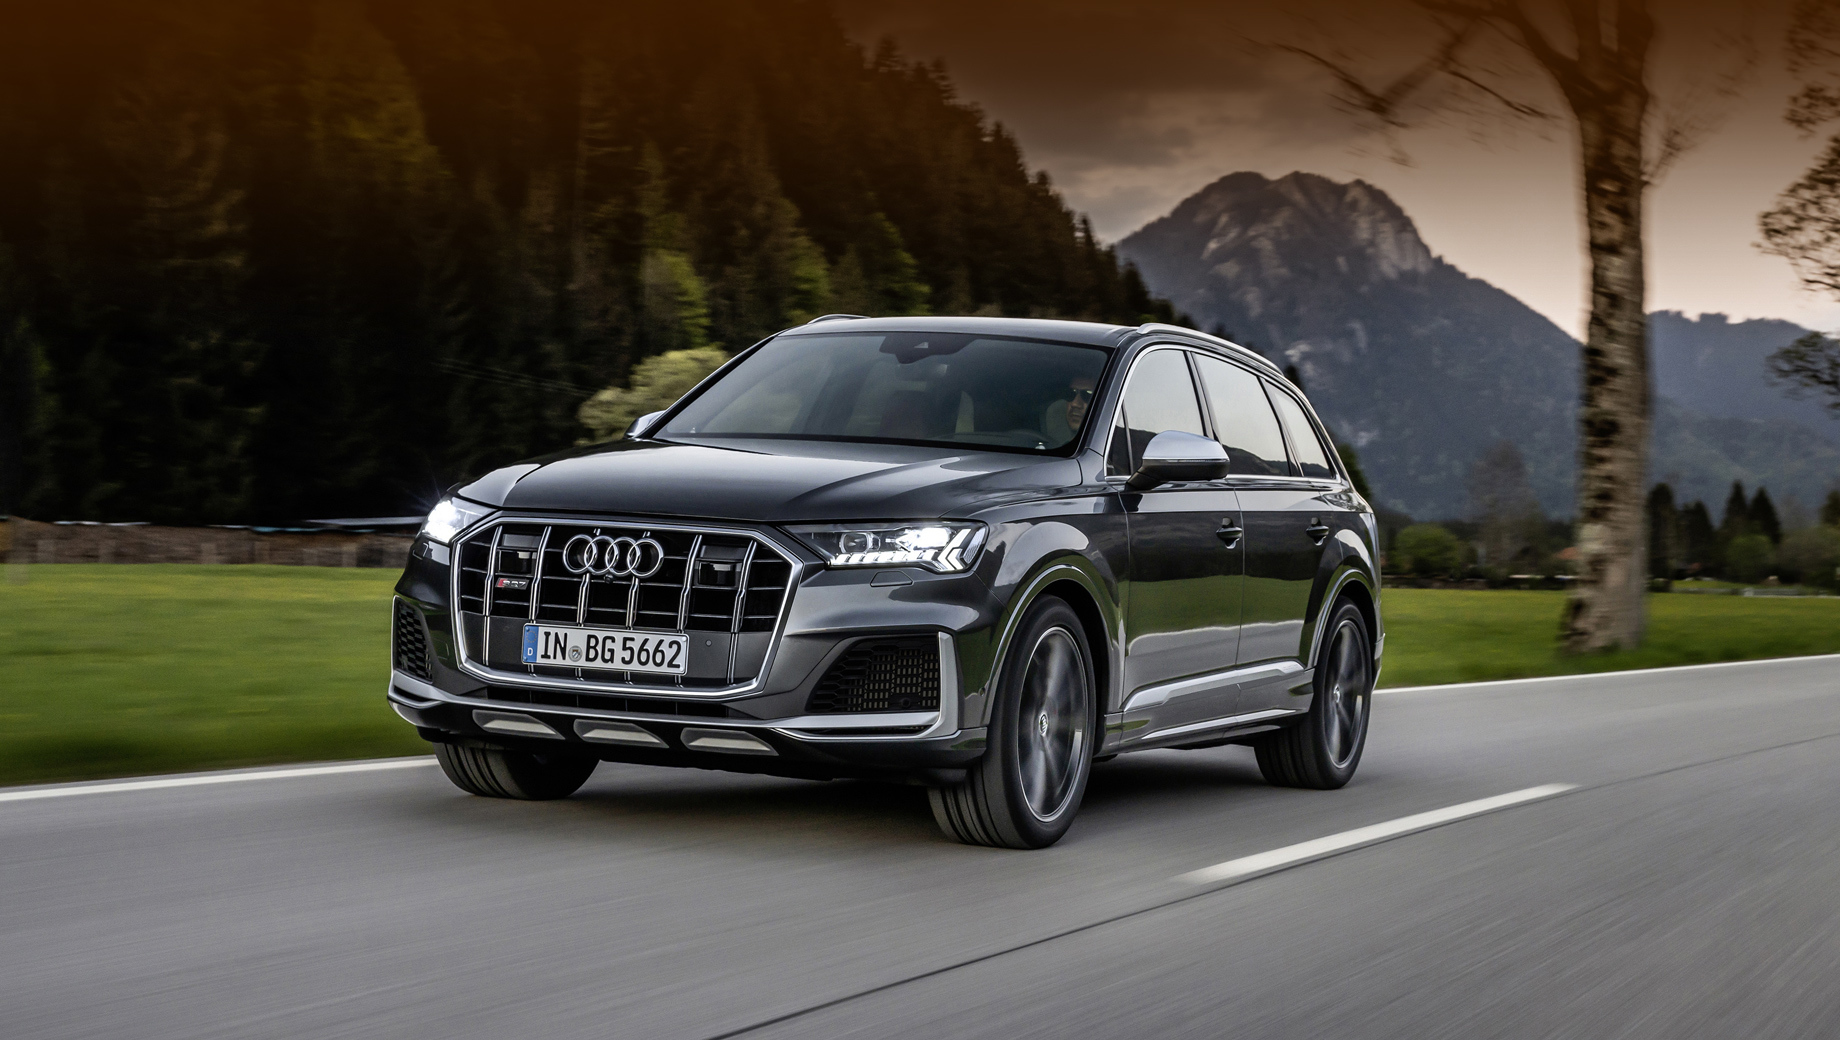 Audi sq7,Audi sq8. Для SQ7 TFSI и SQ8 TFSI заявлен разгон с нуля до сотни за 4,1 с, а от 80 до 120 км/ч за 3,8 с, максималка ограничена электроникой на уровне 250 км/ч. Комбинированный расход топлива: 12,0–12,1 л/100 км в зависимости от комплектации.